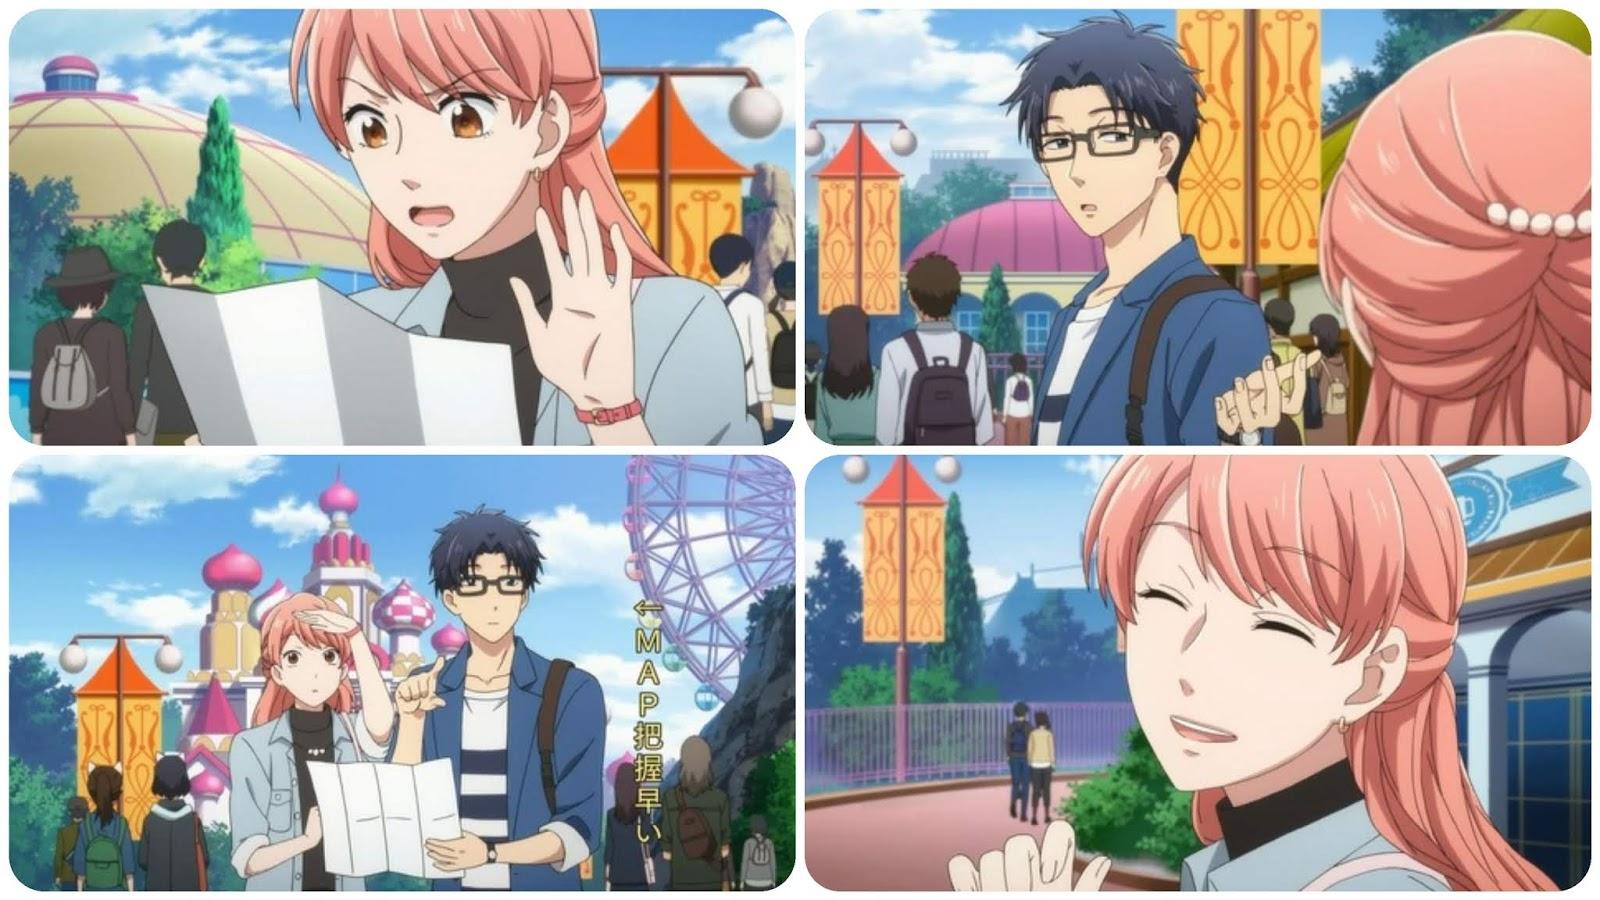 Anime Nikki Wotakoi Love Is Hard For Otaku Episode 9